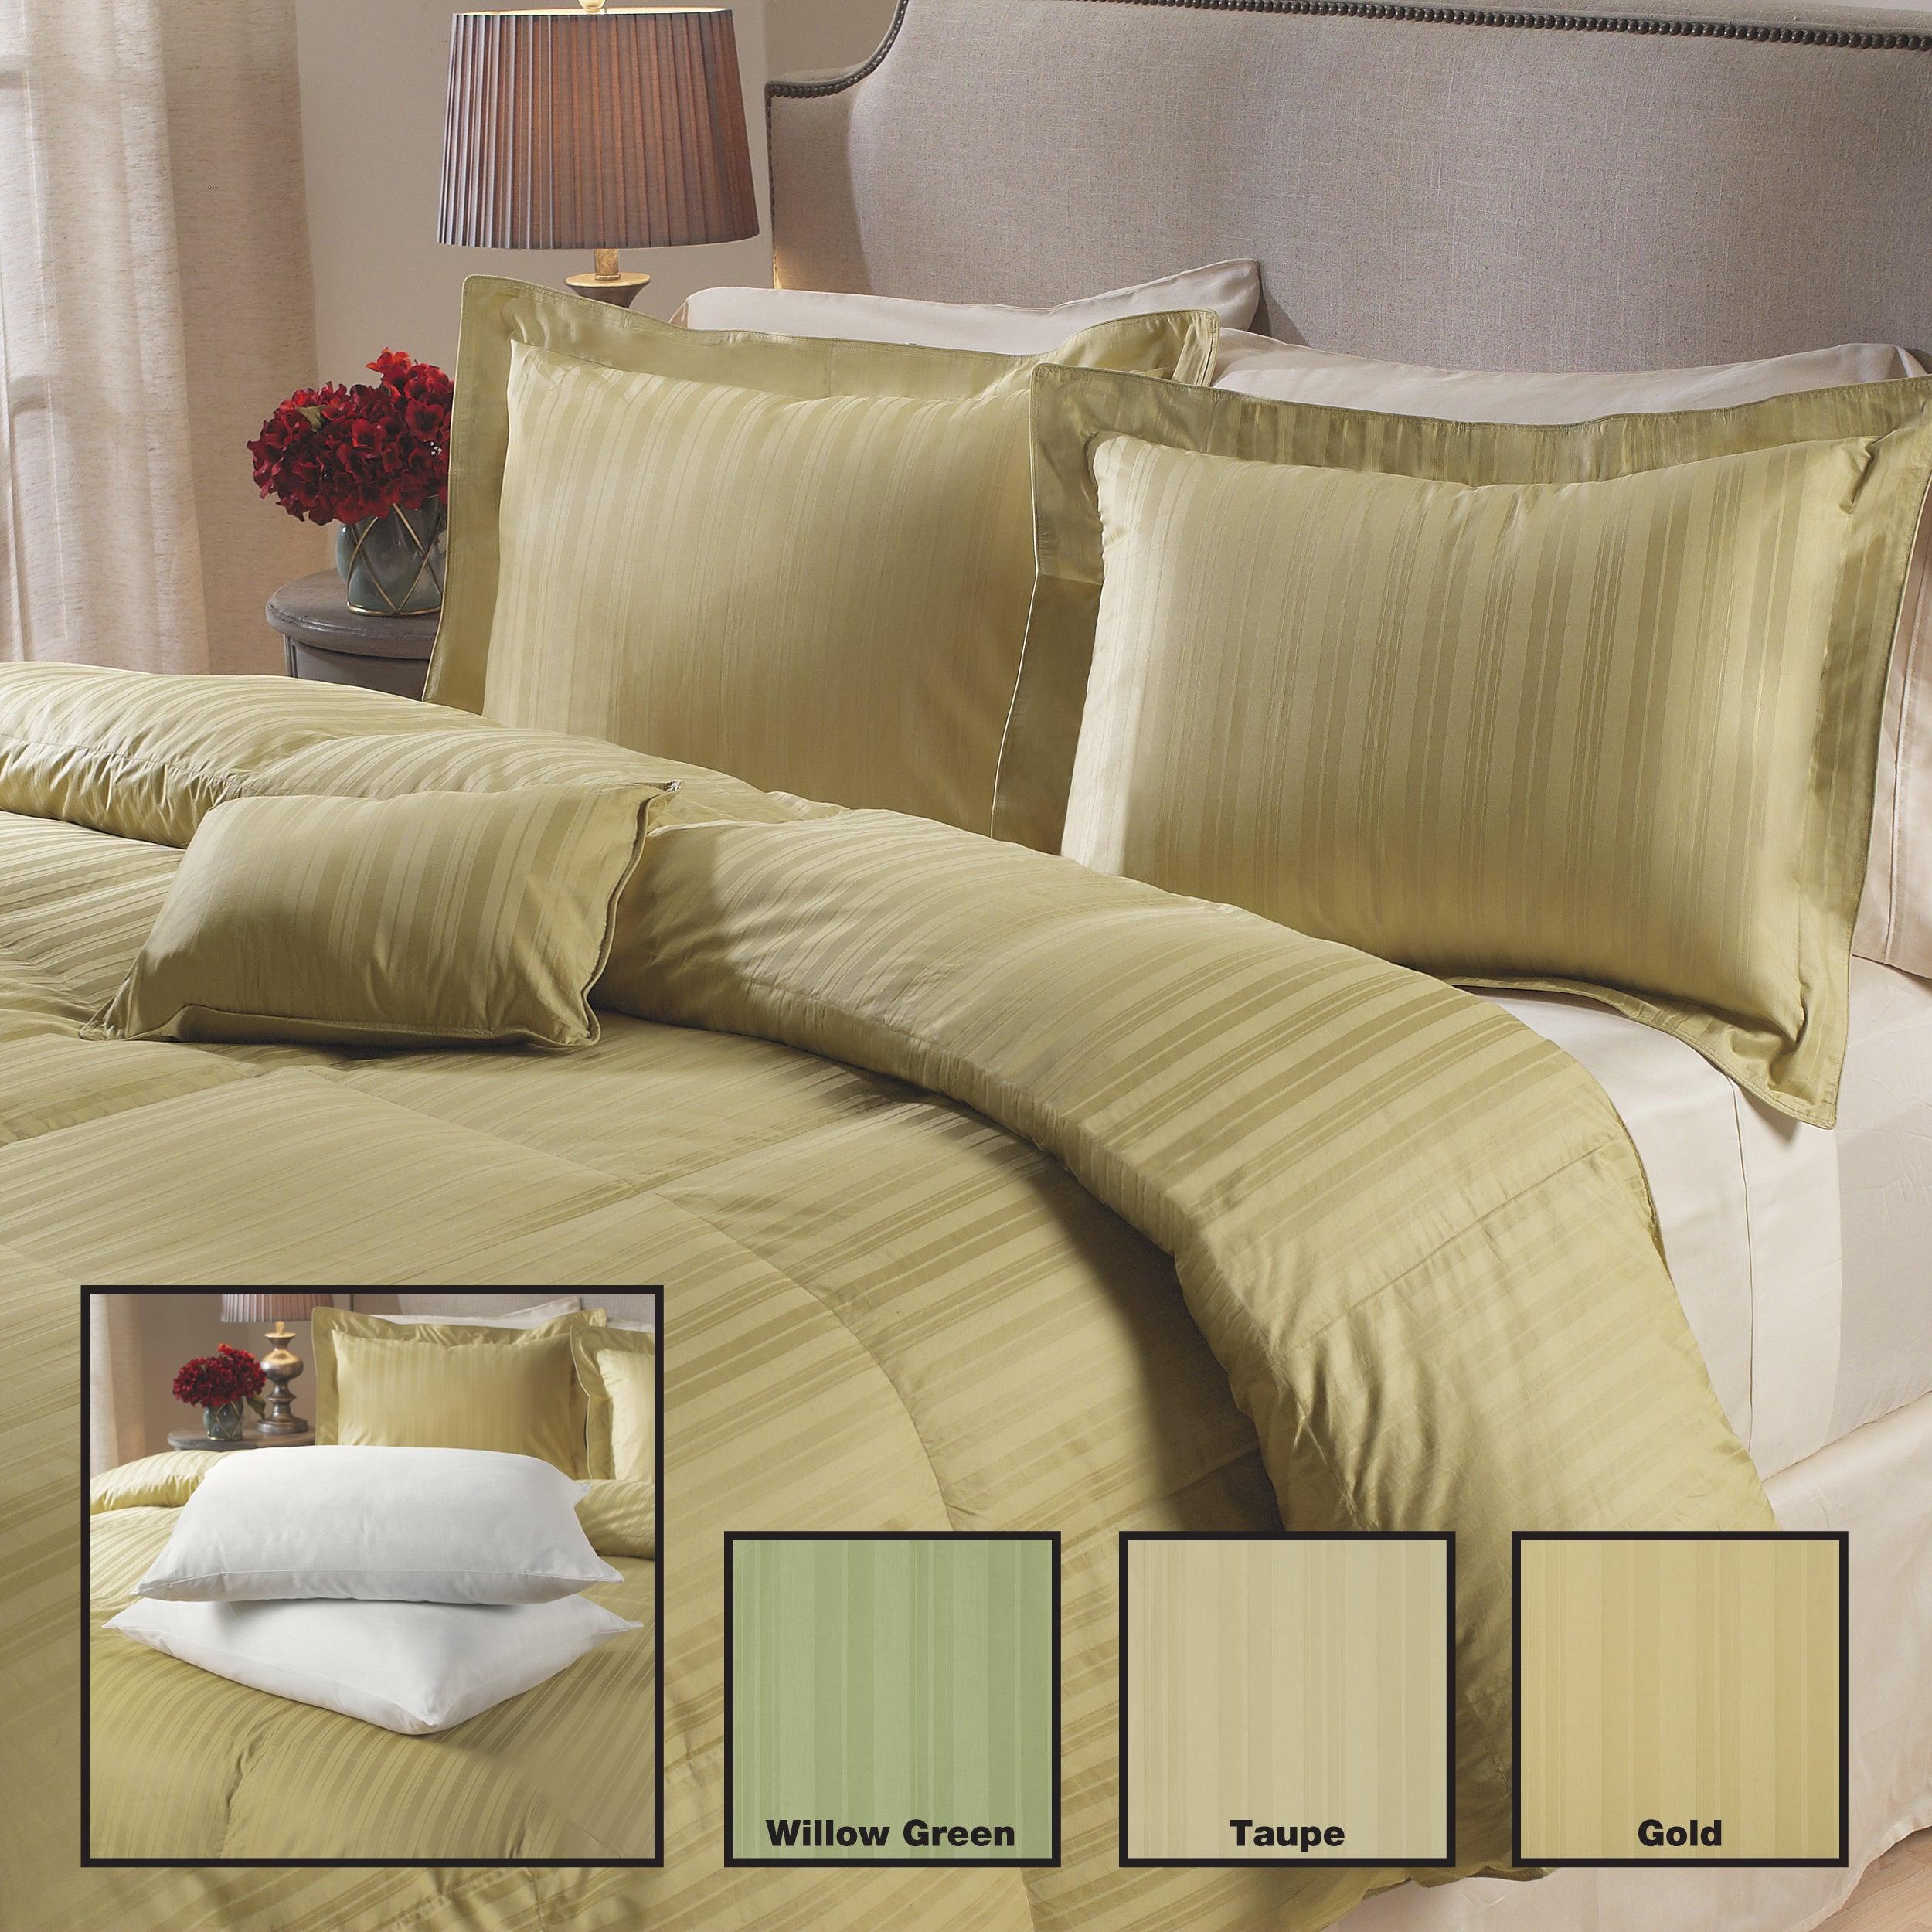 Luxurious 400 Thread Count White Down Comforter 6-piece Set